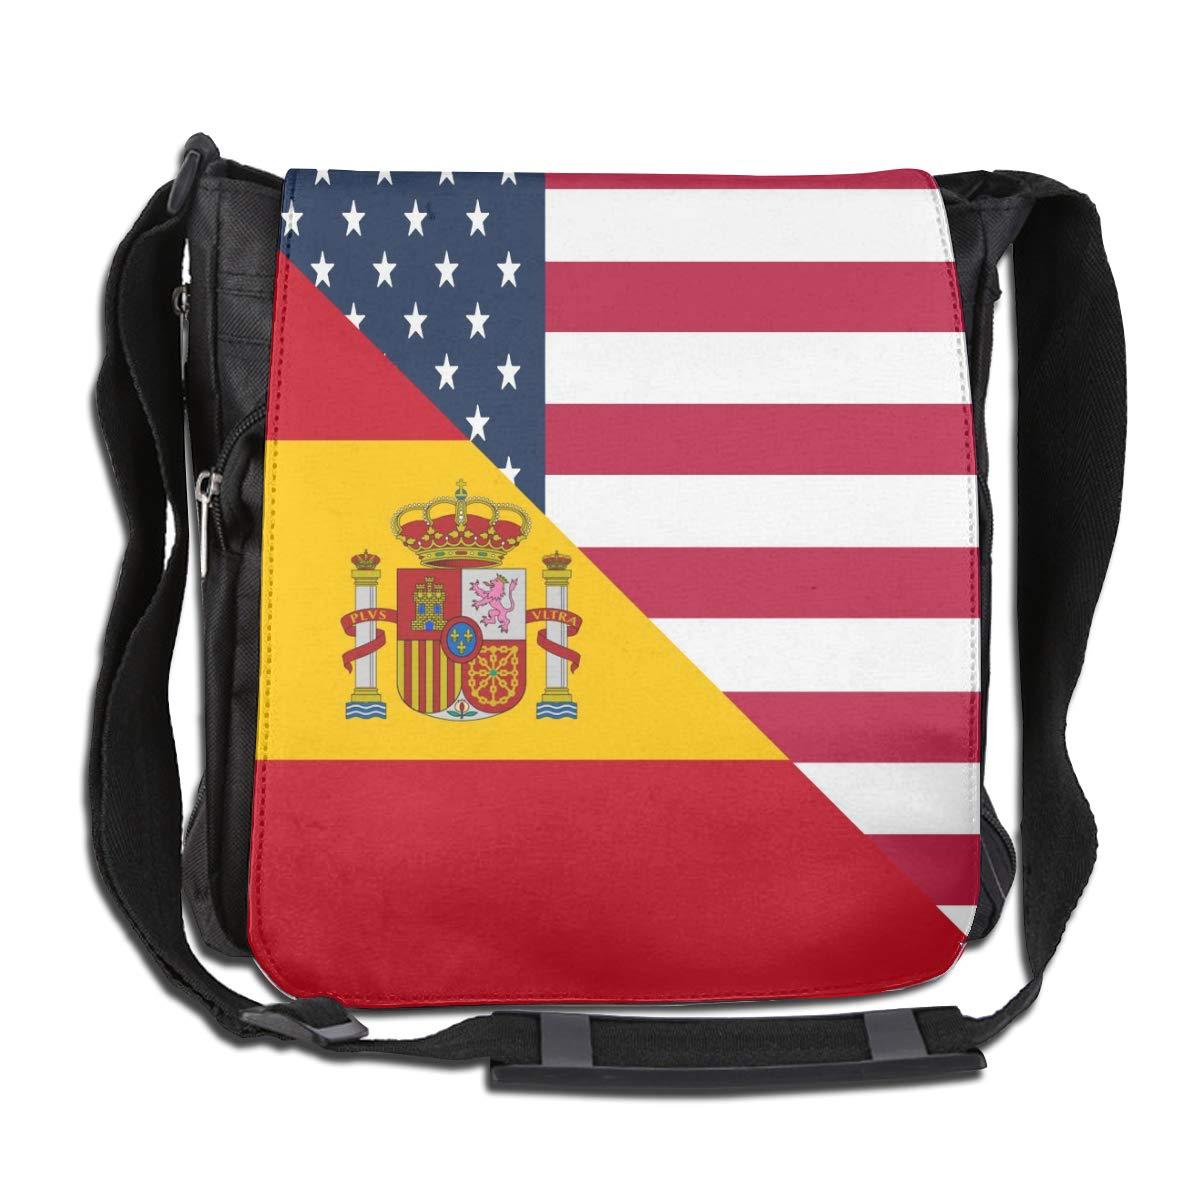 Unisex Casual Satchel Messenger Bags American And Spain Flag Crossbody Shoulder Bag Hiking Bags For School//Work//Trips